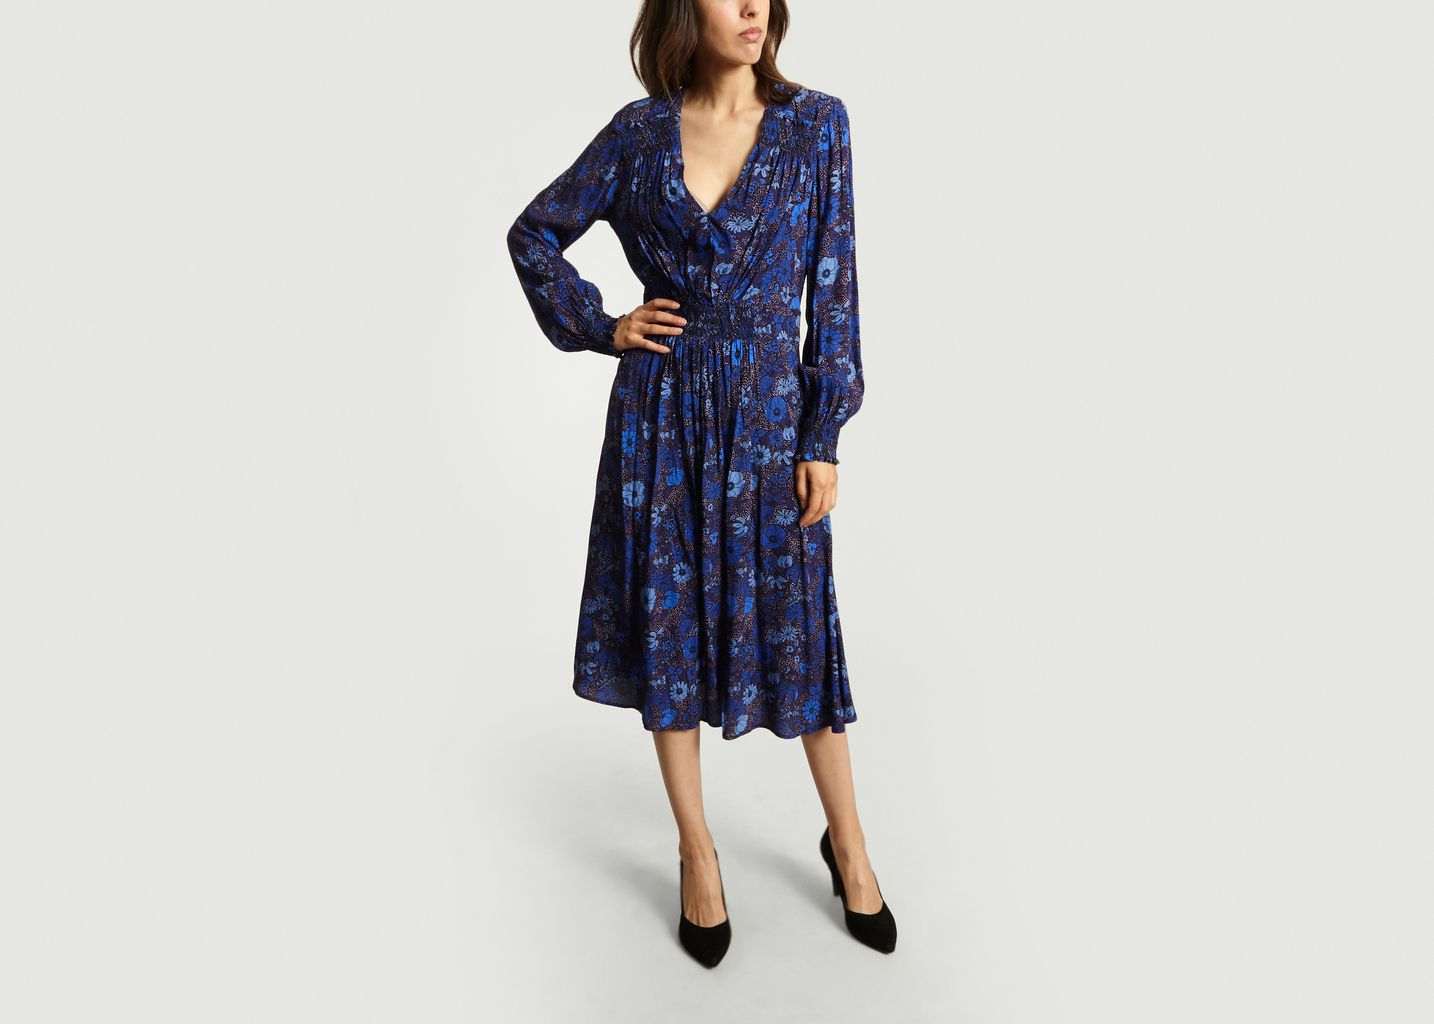 Robe Imprimée Fleurie - Tara Jarmon